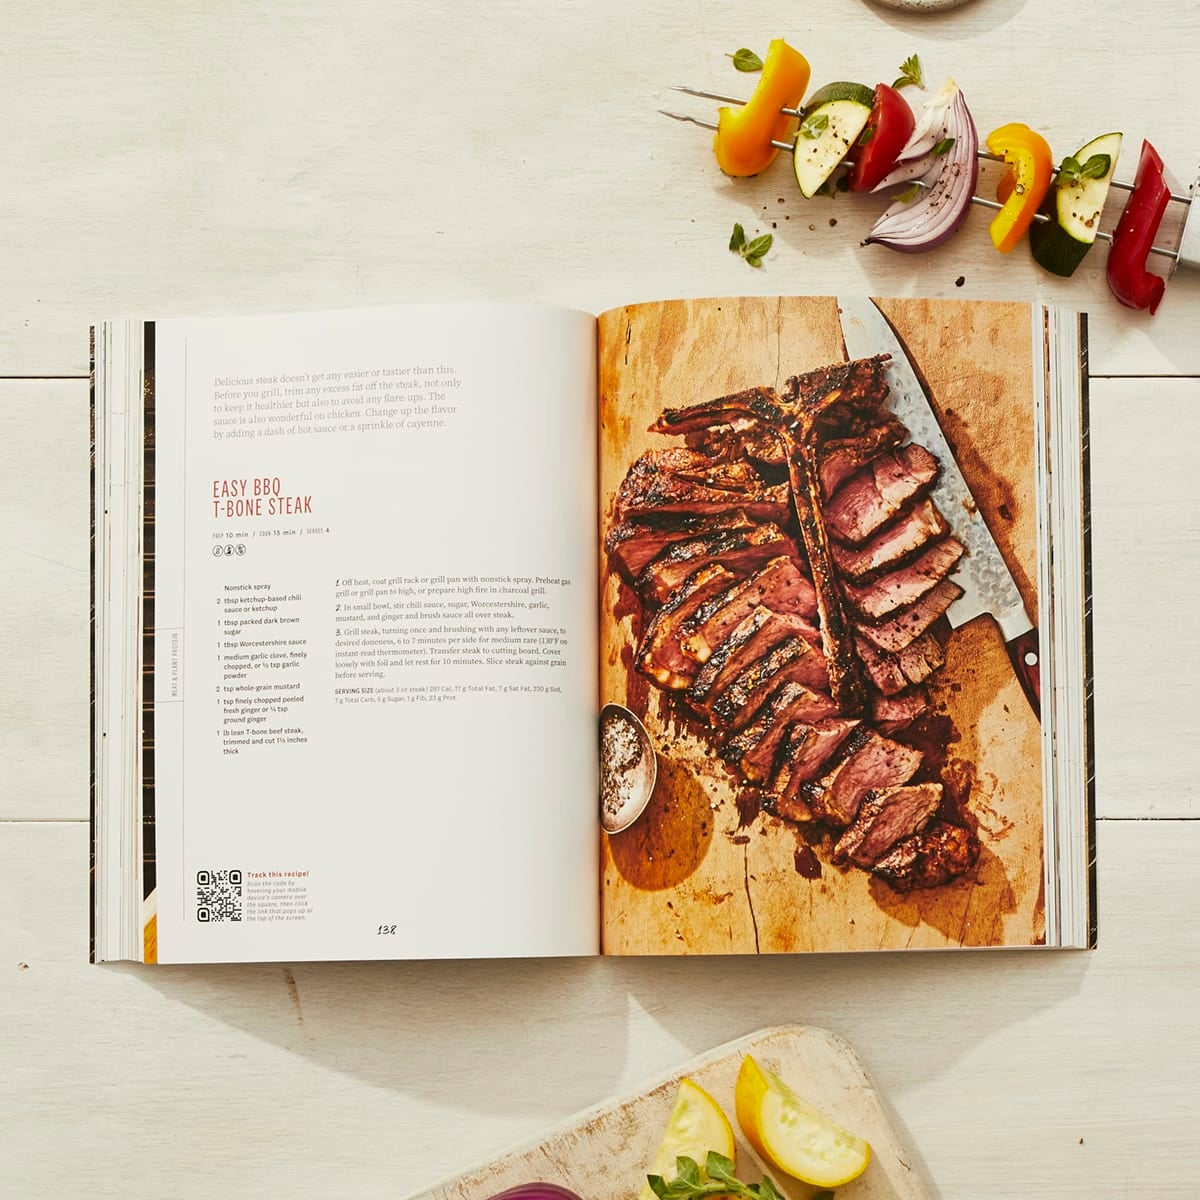 Year Round Grilling Cookbook - steak recipe